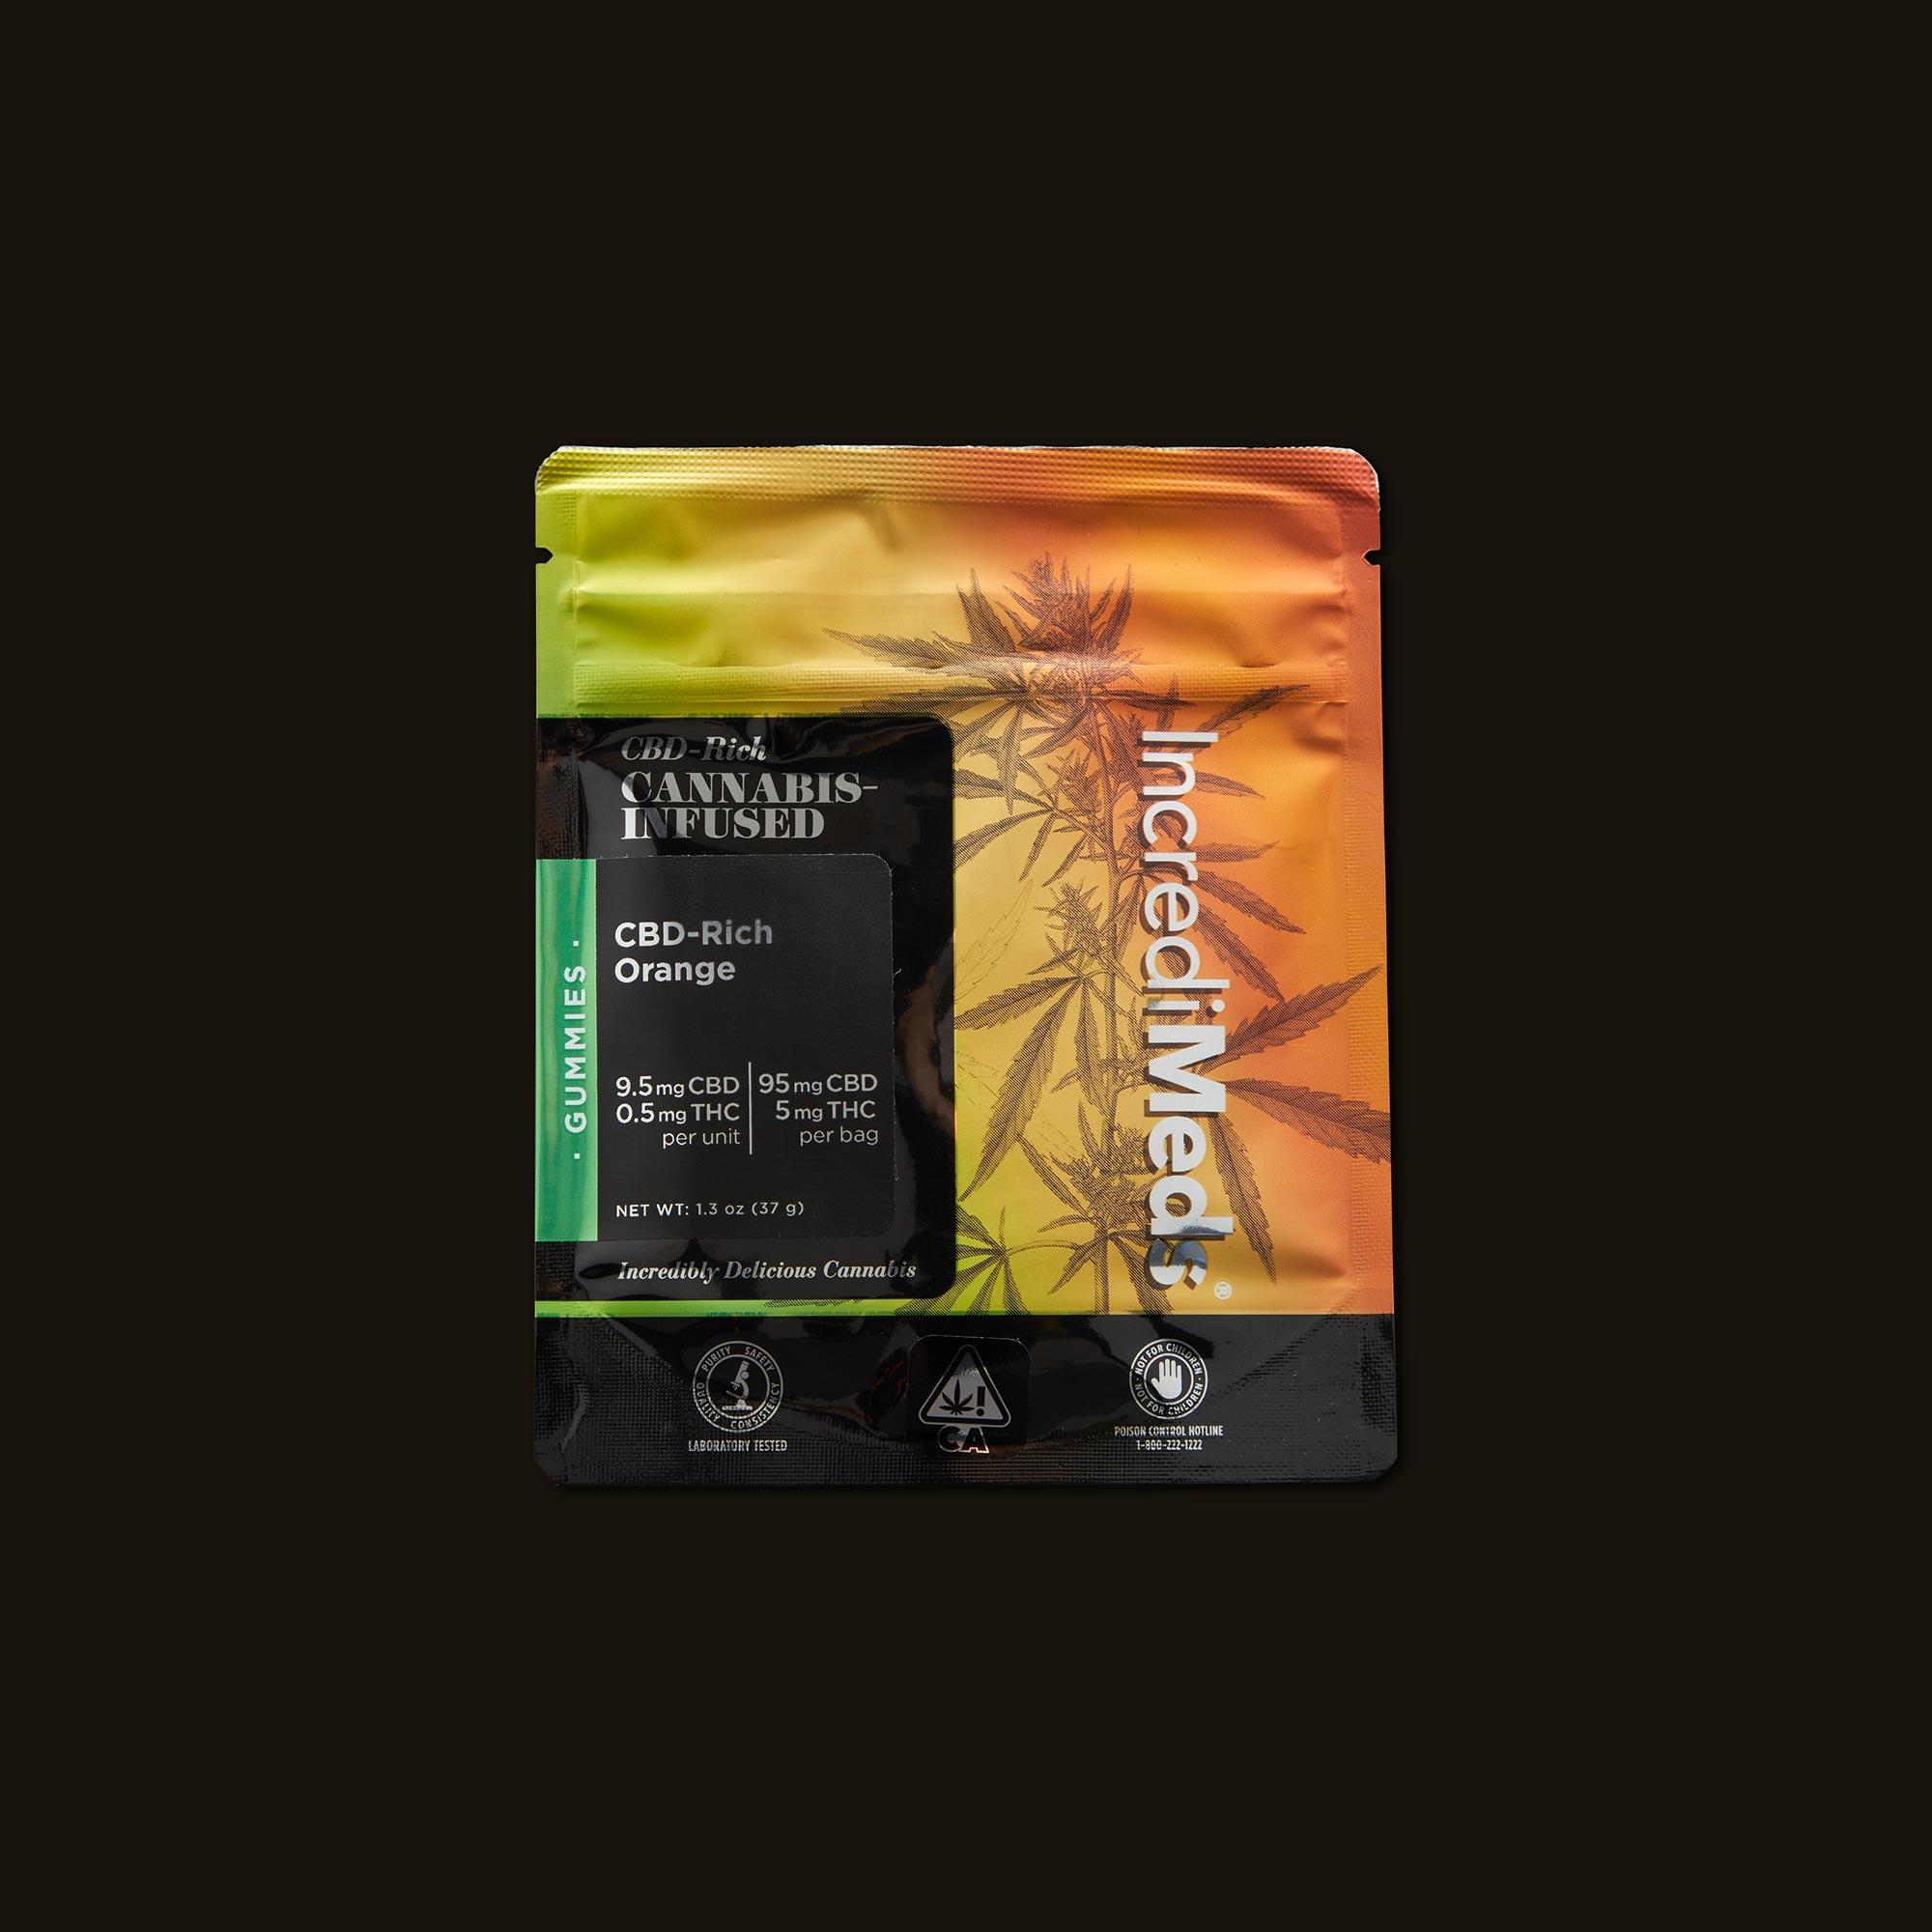 IncrediMeds CBD-Rich Orange Gummies Front of Packaging